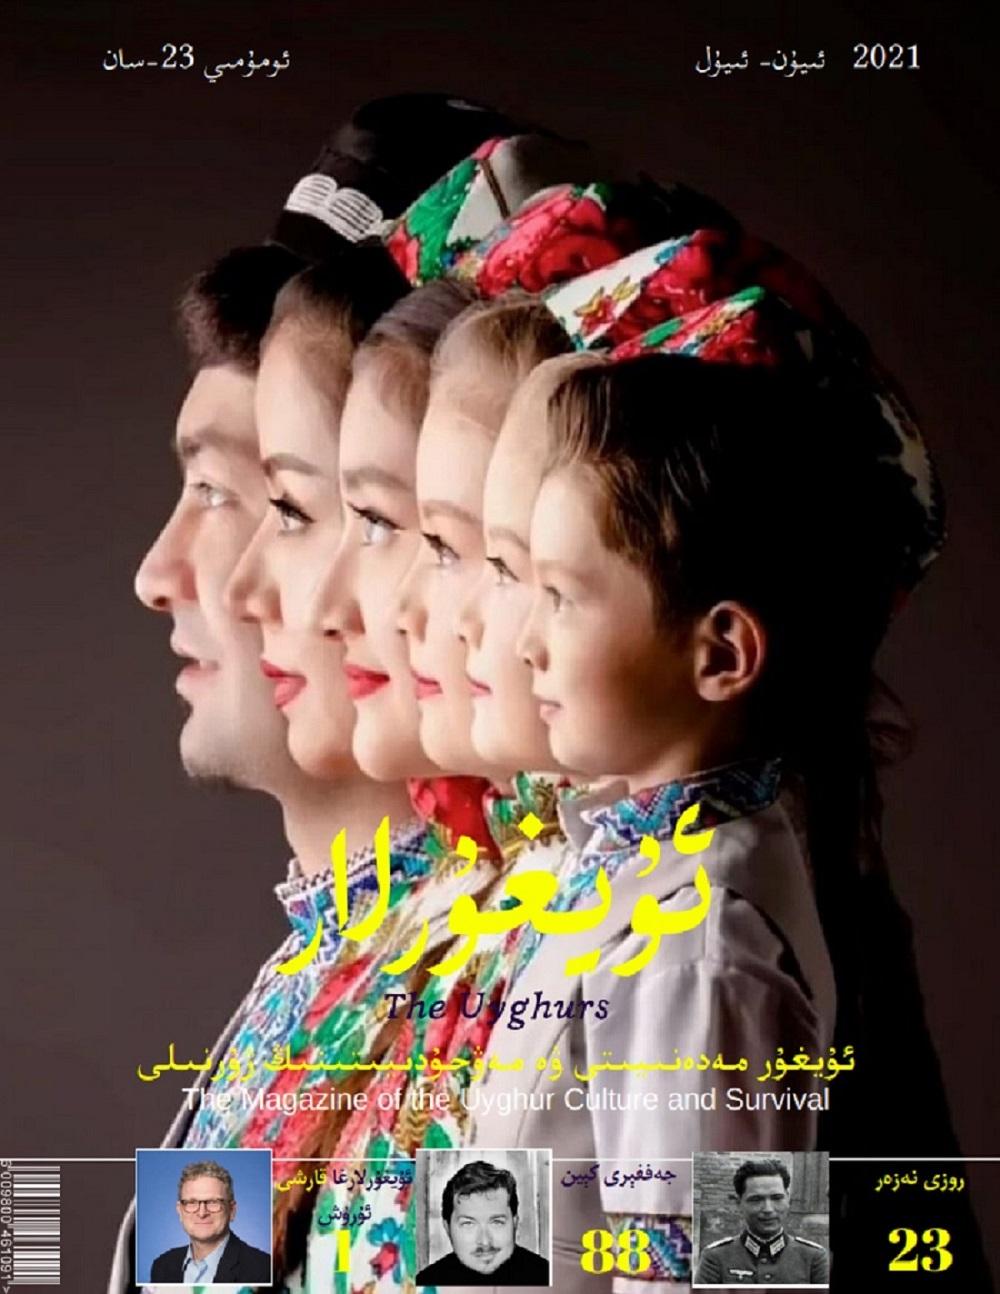 Uyghurs 23 - ئۇيغۇرلار 2021 ئىيۇن-ئىيۇل ئومۇمىي 23-سان